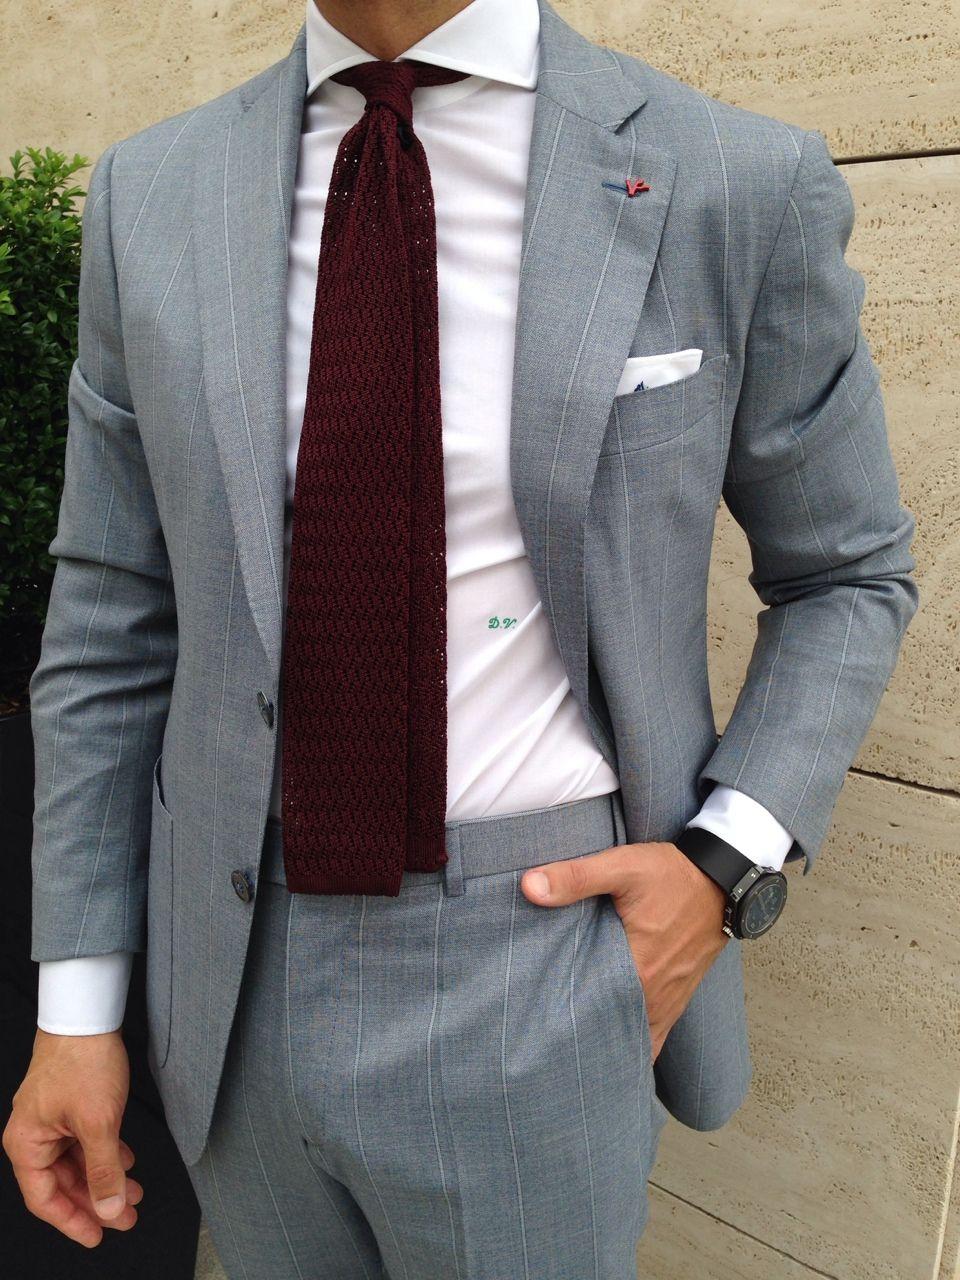 Mens Gray Suit With Dark Red Tie Accent Gentlemenswear Style